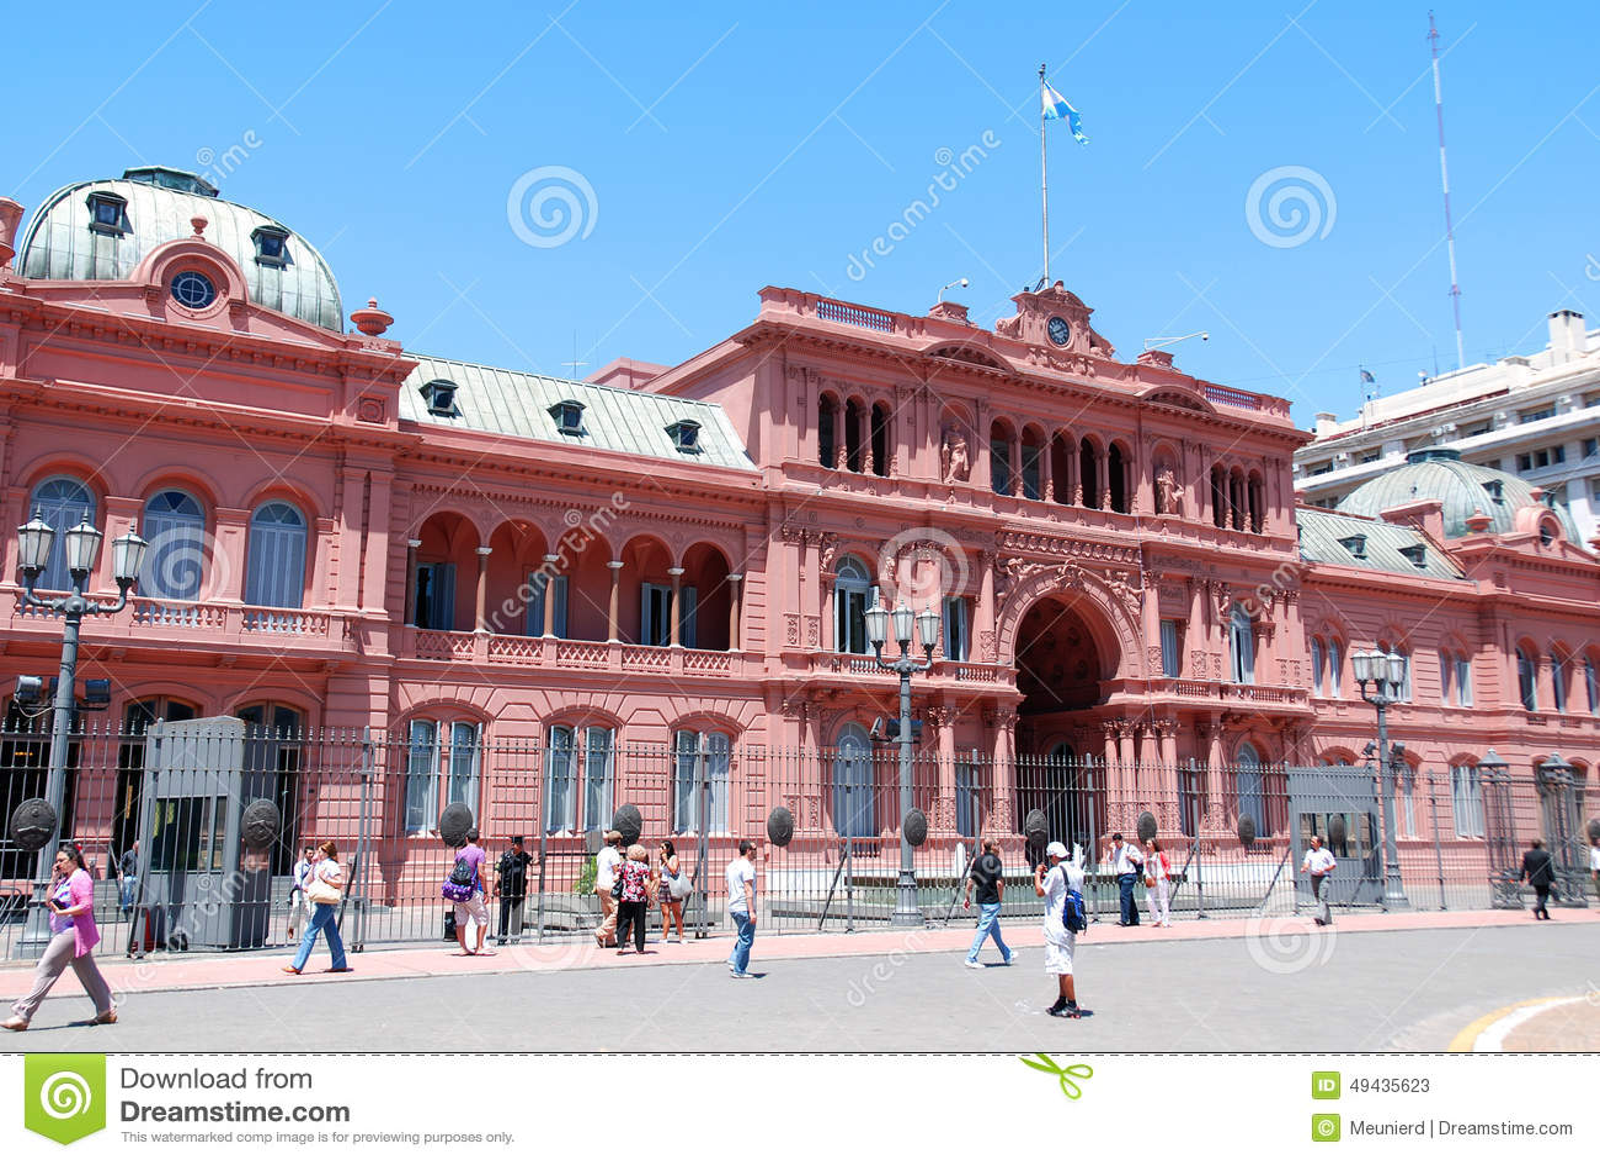 Casa rosada pink house editorial stock photo image for Casa argentina